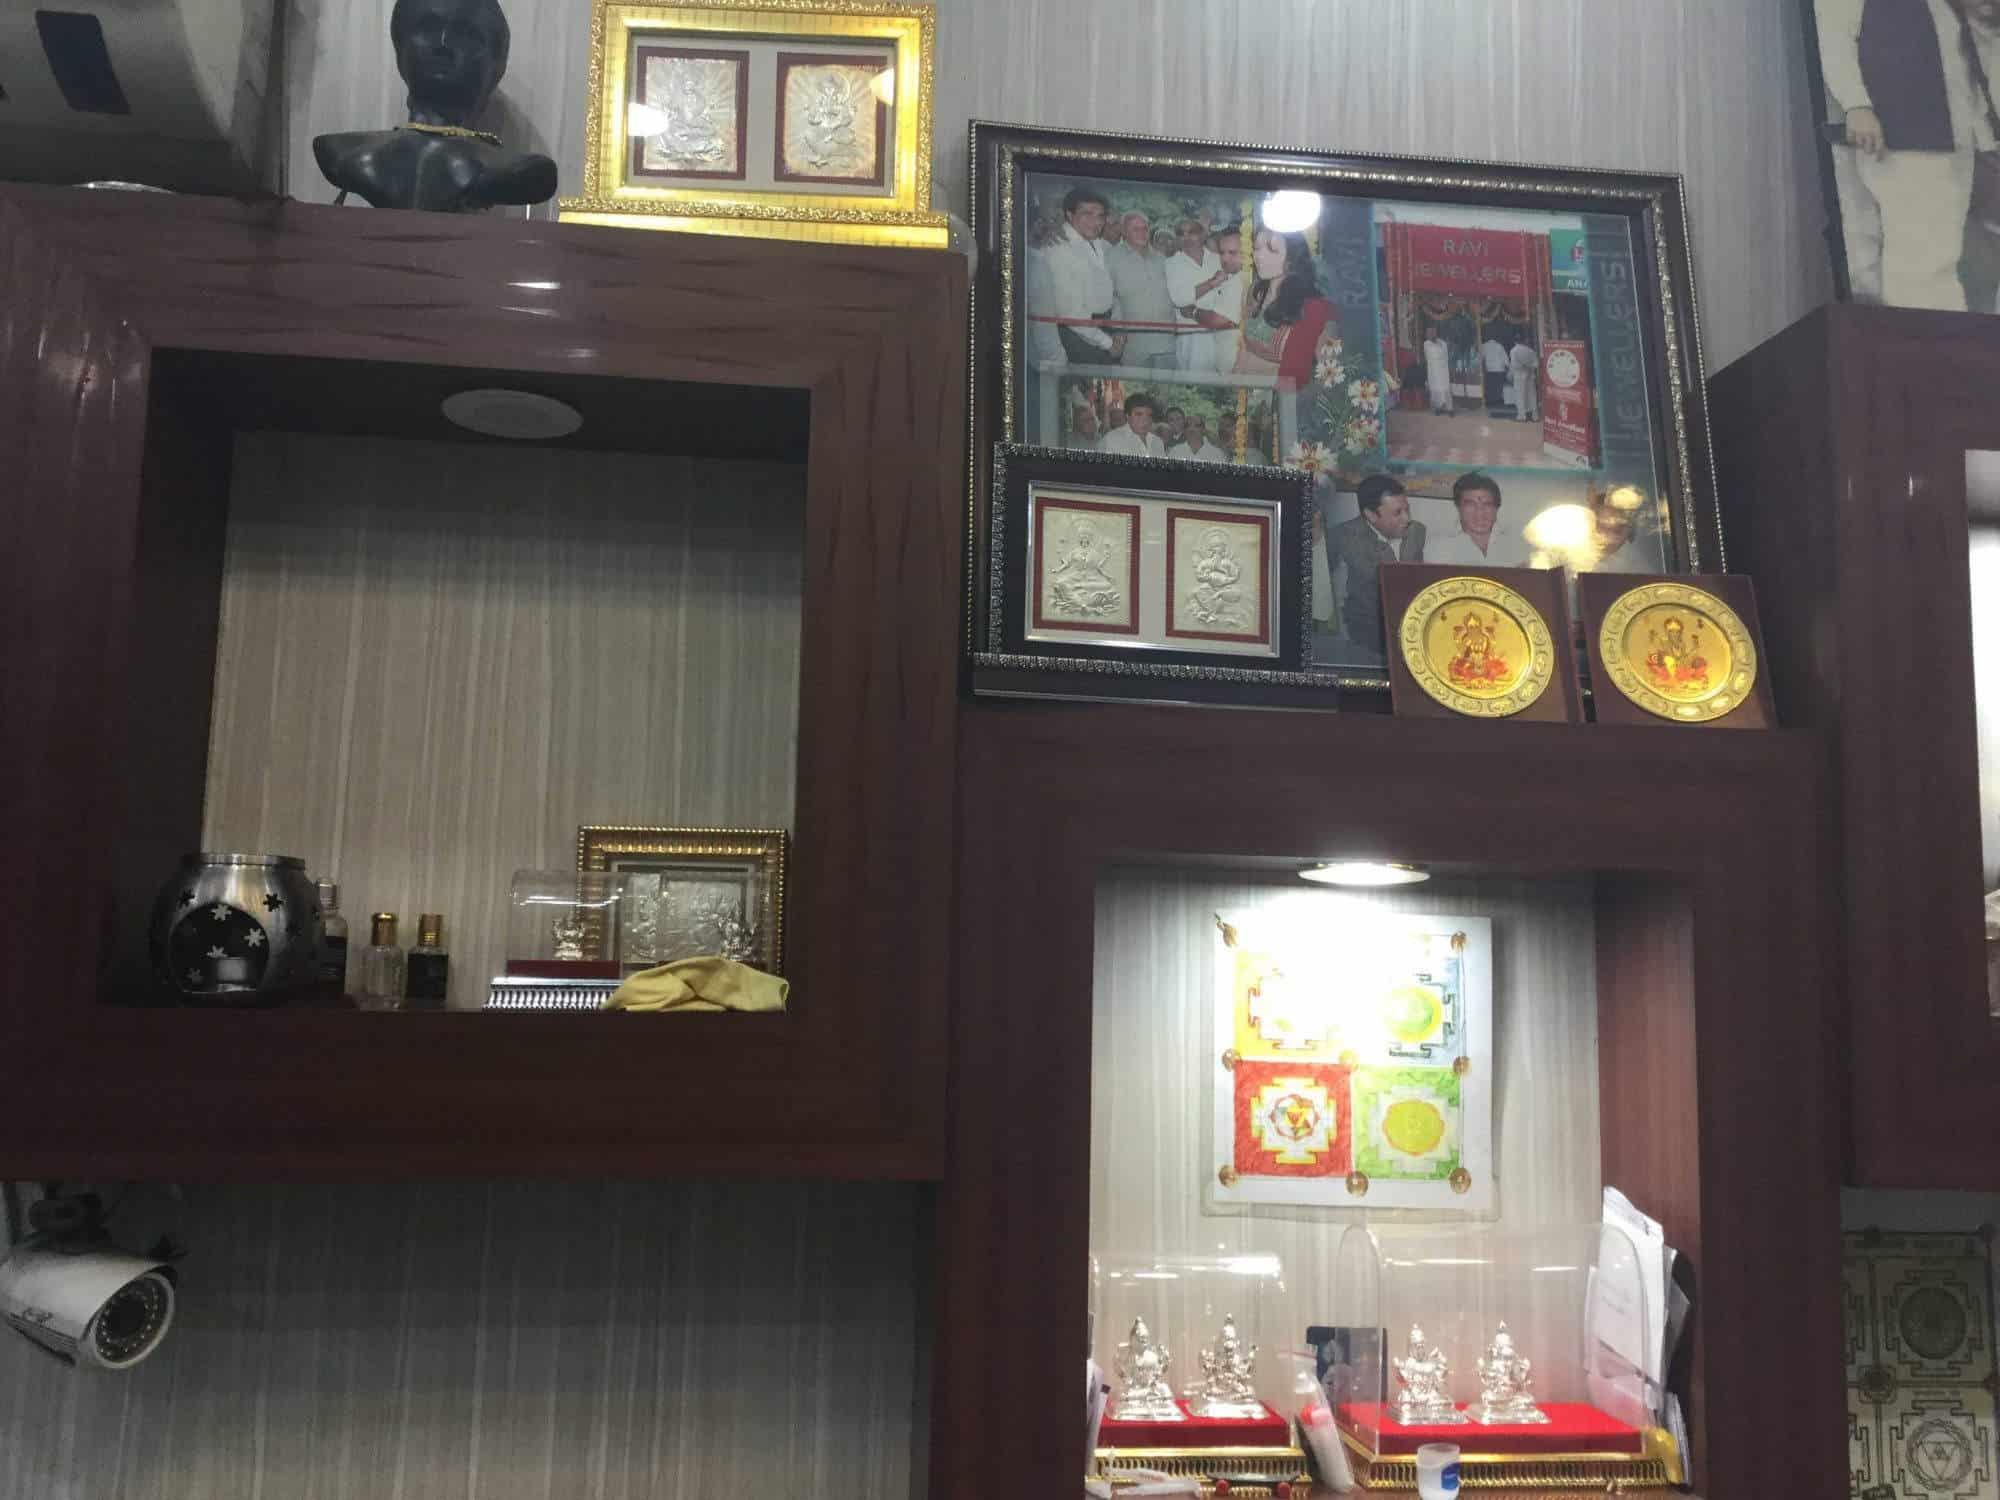 Ravi Jewellers, Raj Nagar - Jewellery Showrooms in Delhi - Justdial